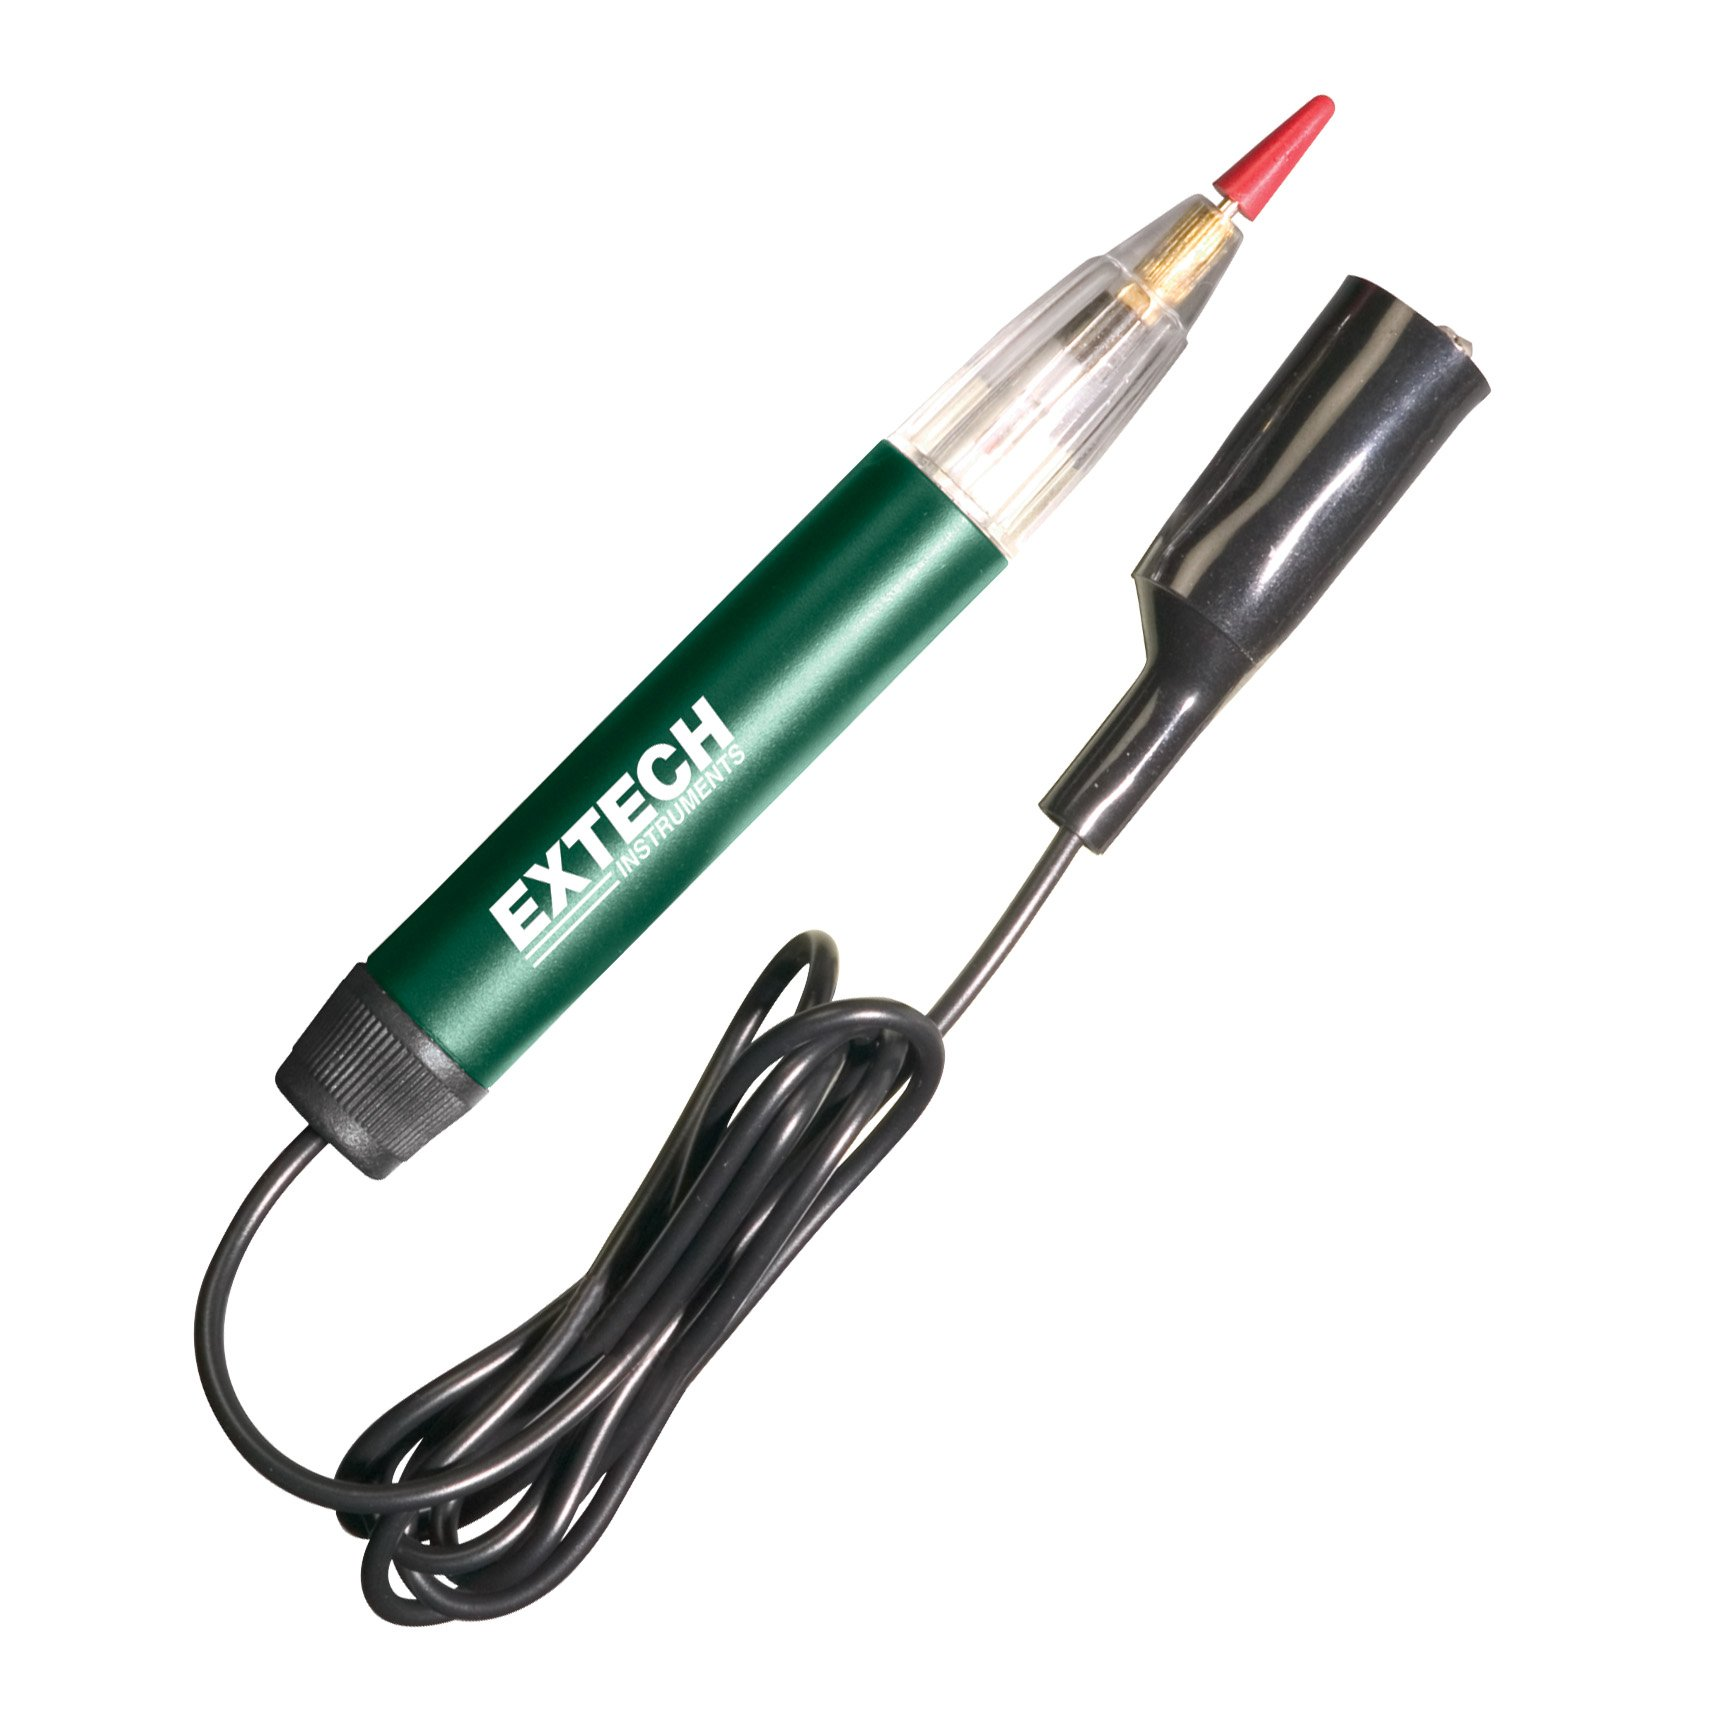 Cheap Continuity Light Tester Find Deals On 12 24 Volt Circuit Test Probe Check Auto Circuits Trailer Get Quotations Extech Et40